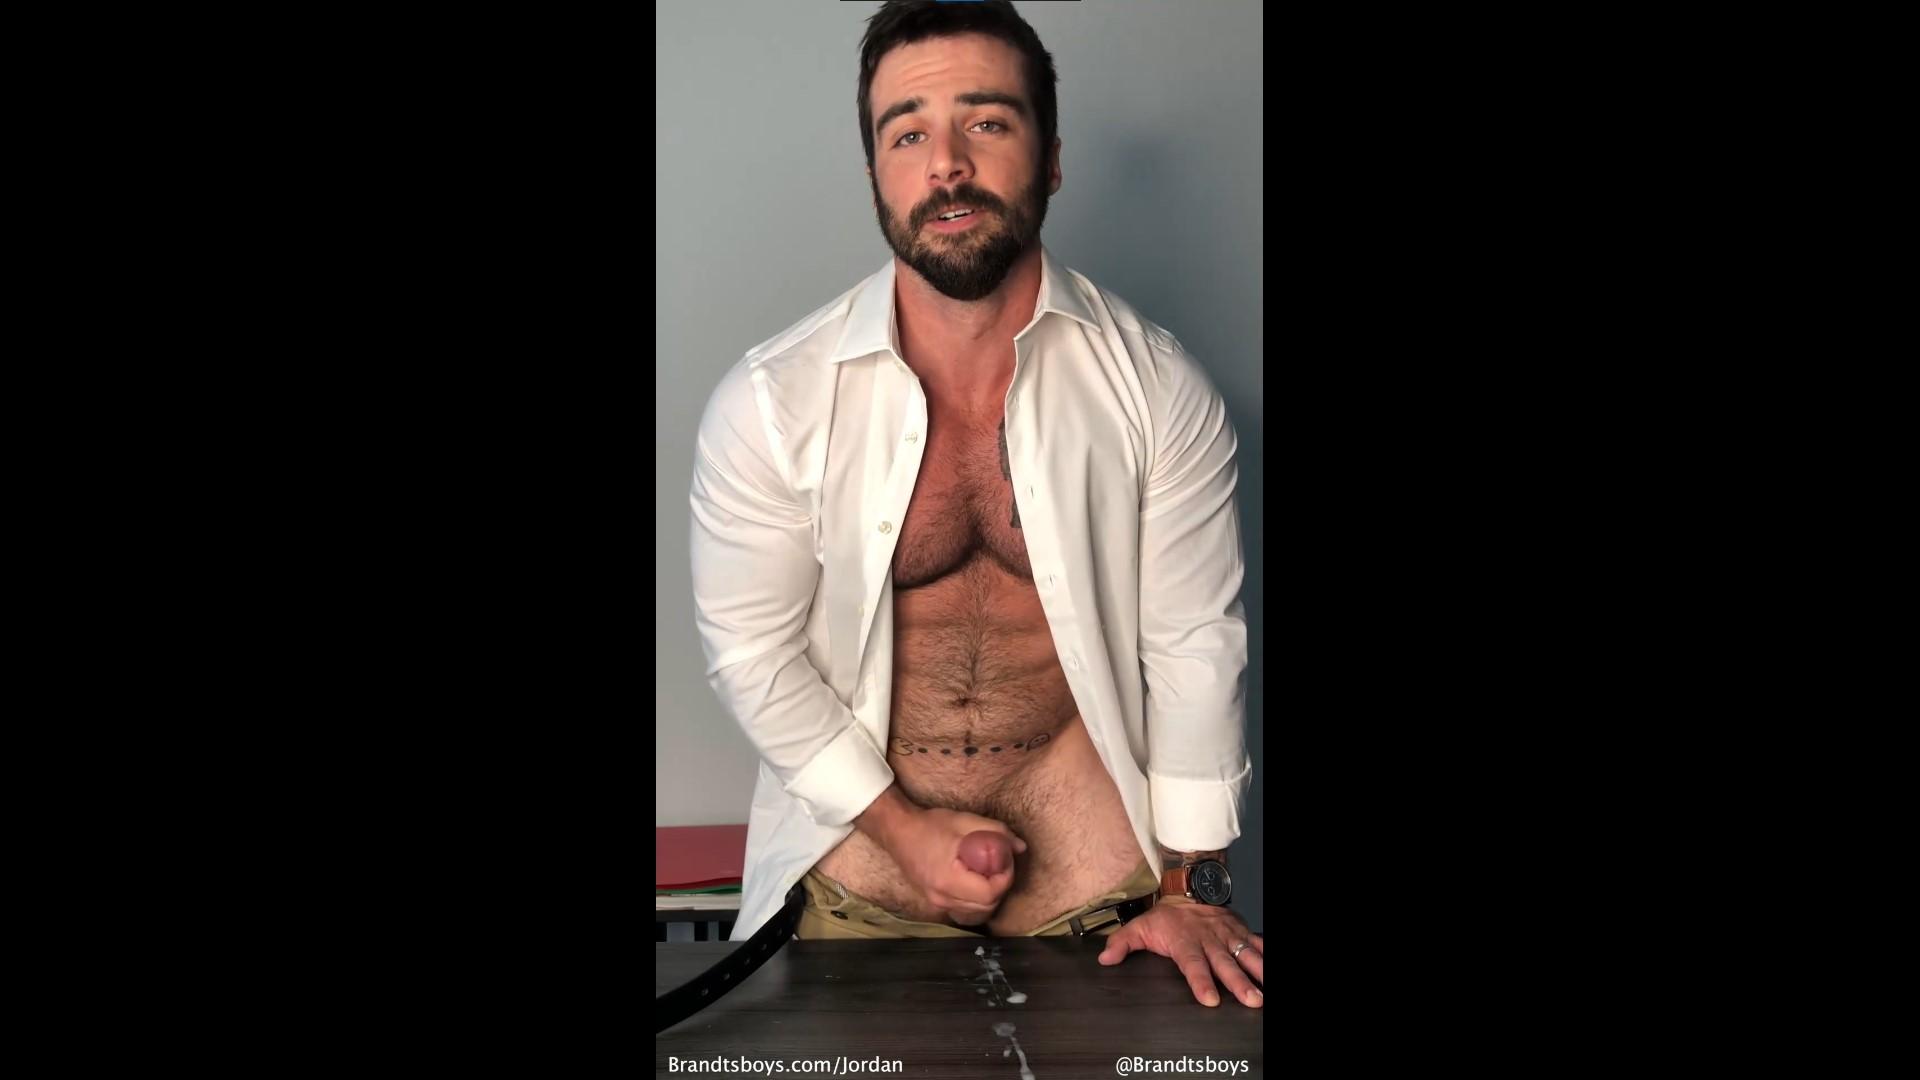 Jerking off and cumming over the desk - Teacher Role Play - JordanxBrandt